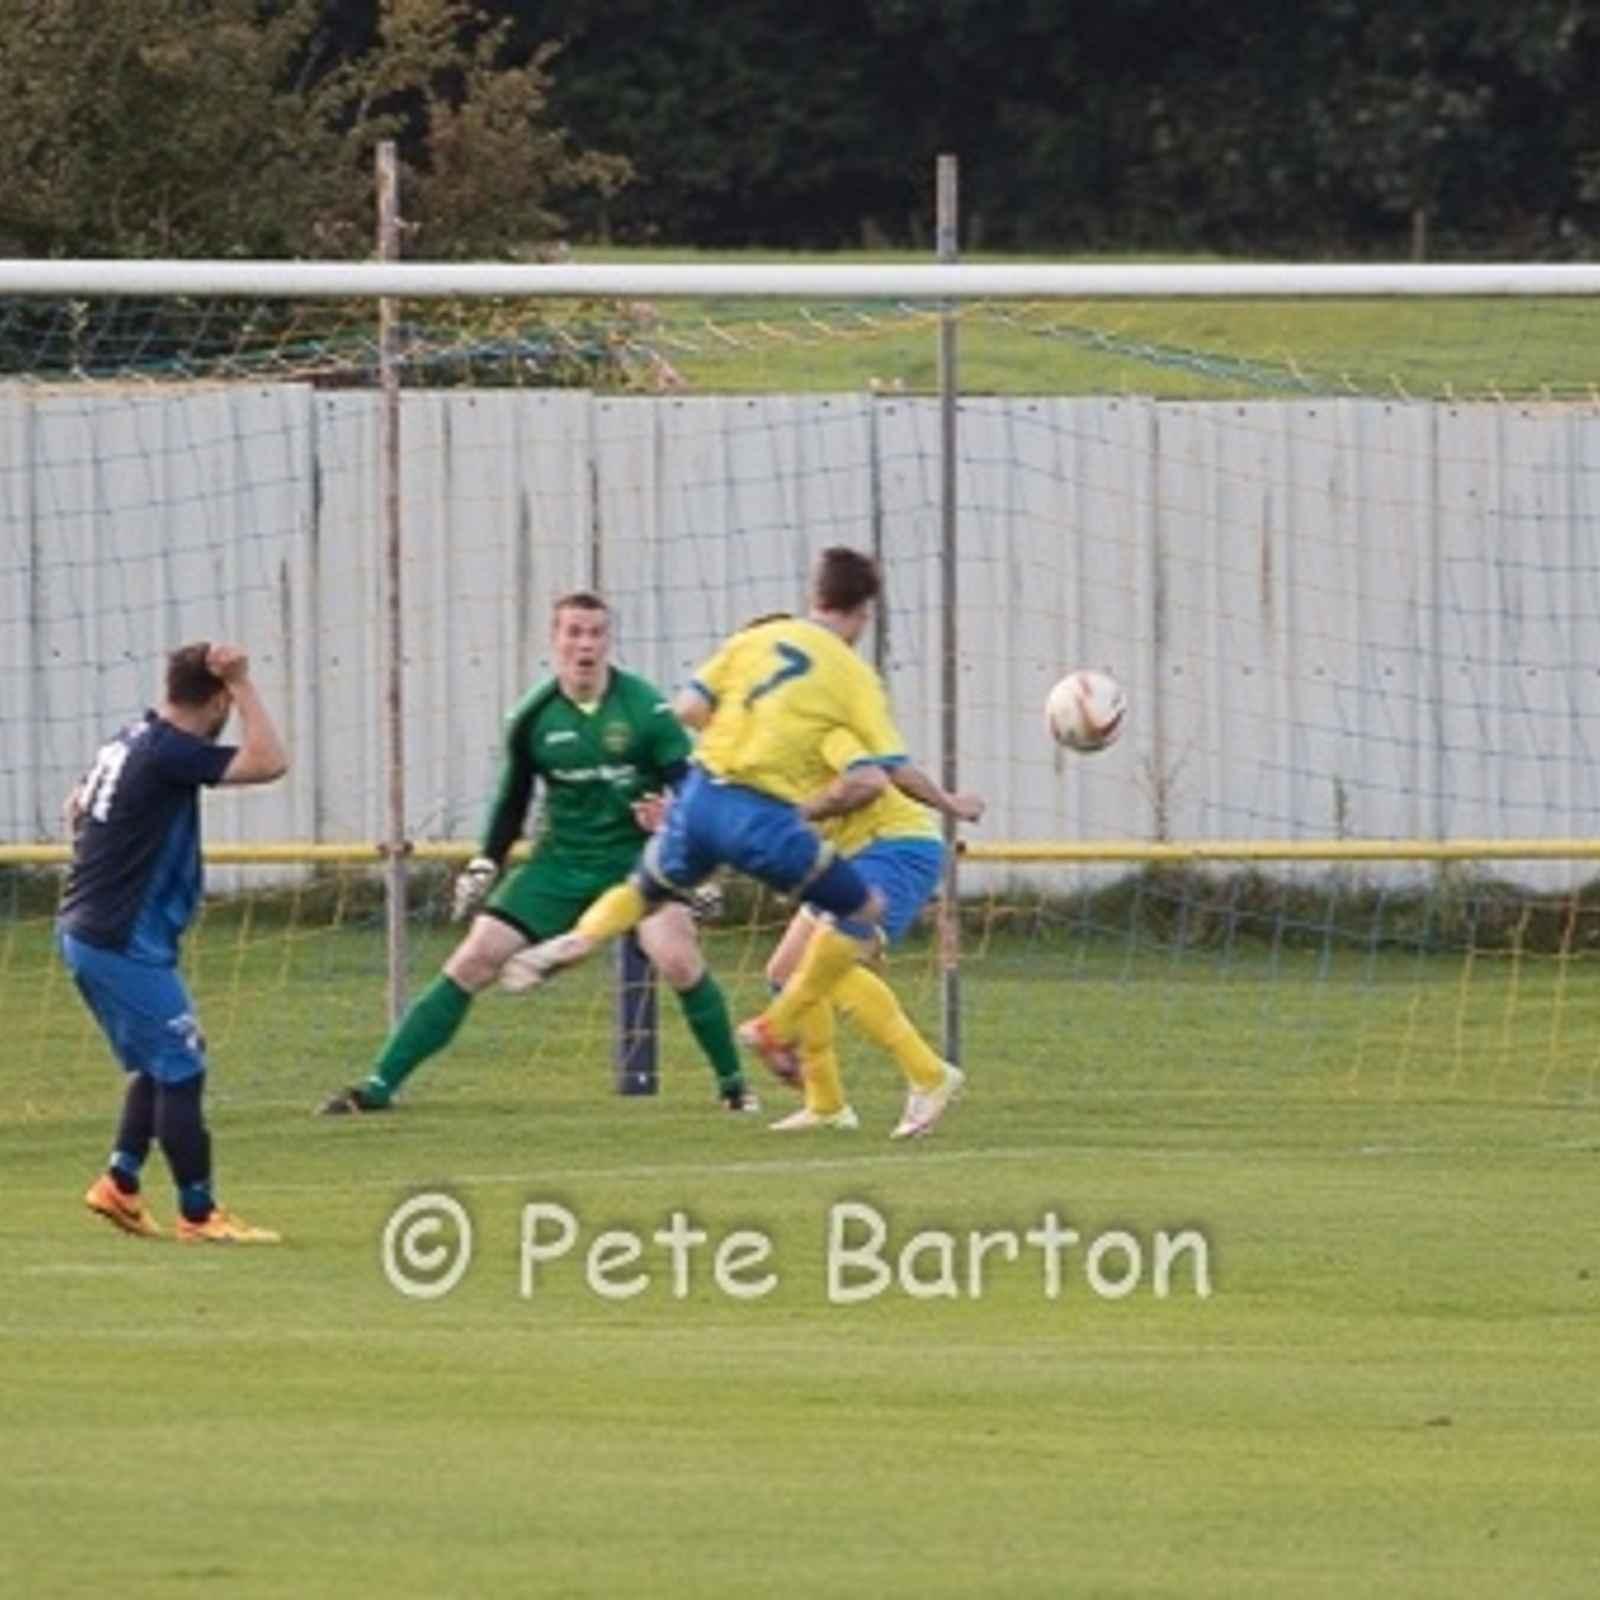 FA Cup Preliminary Round Replay - Ashton Athletic 2 Worksop Town 2 (Ashton Athletic win 4-1 on pens ) - 23/8/16